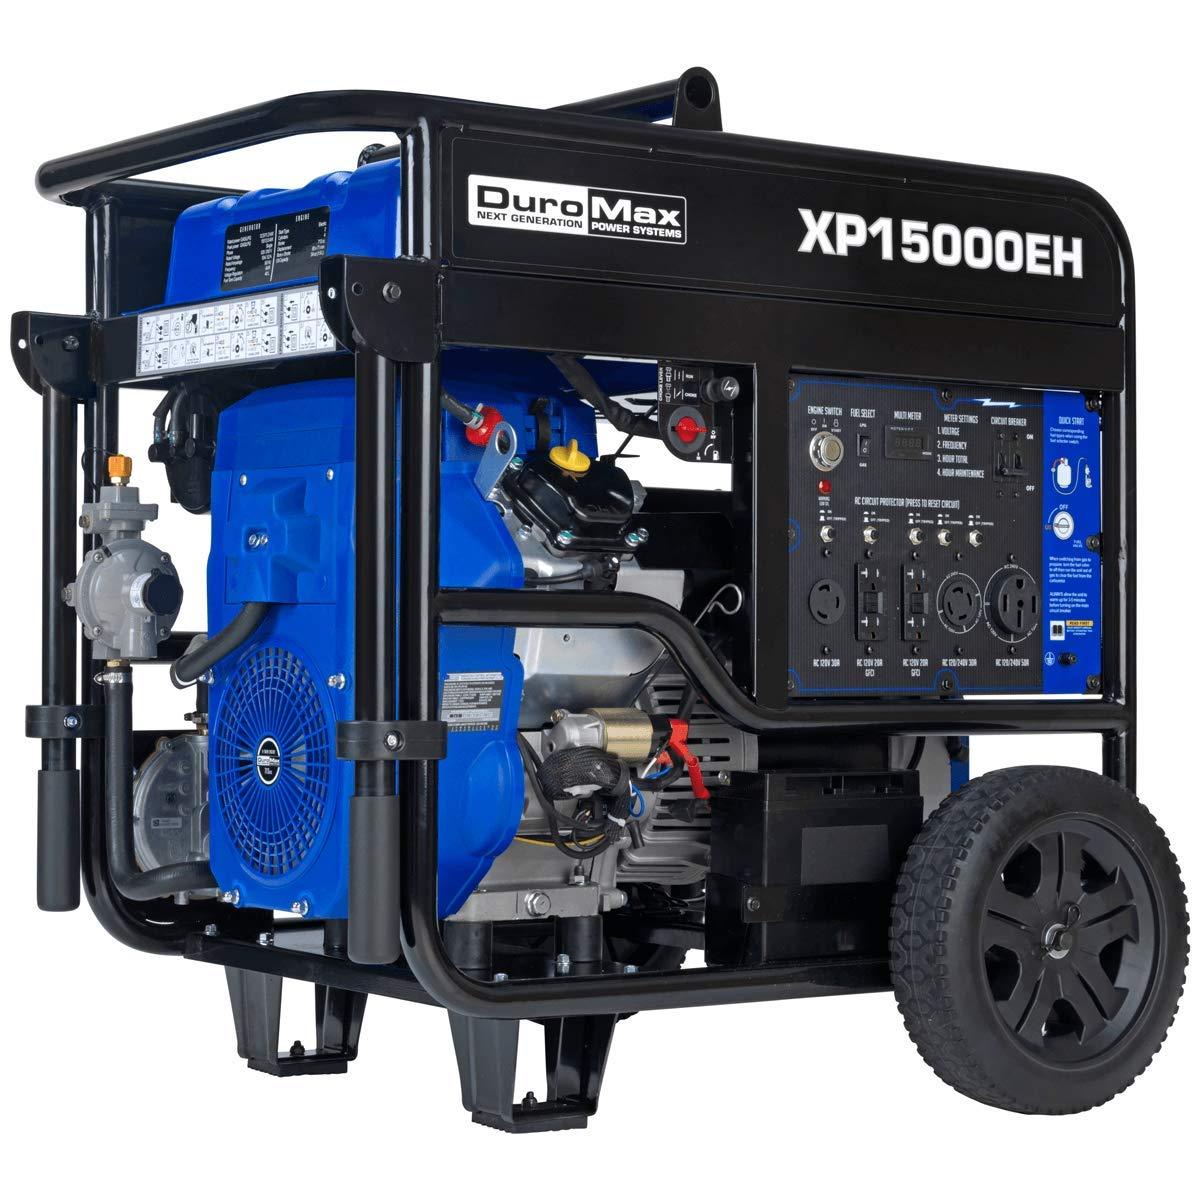 Duromax XP15000EH Dual Fuel 15000 Watt Electric Start Portable Generator